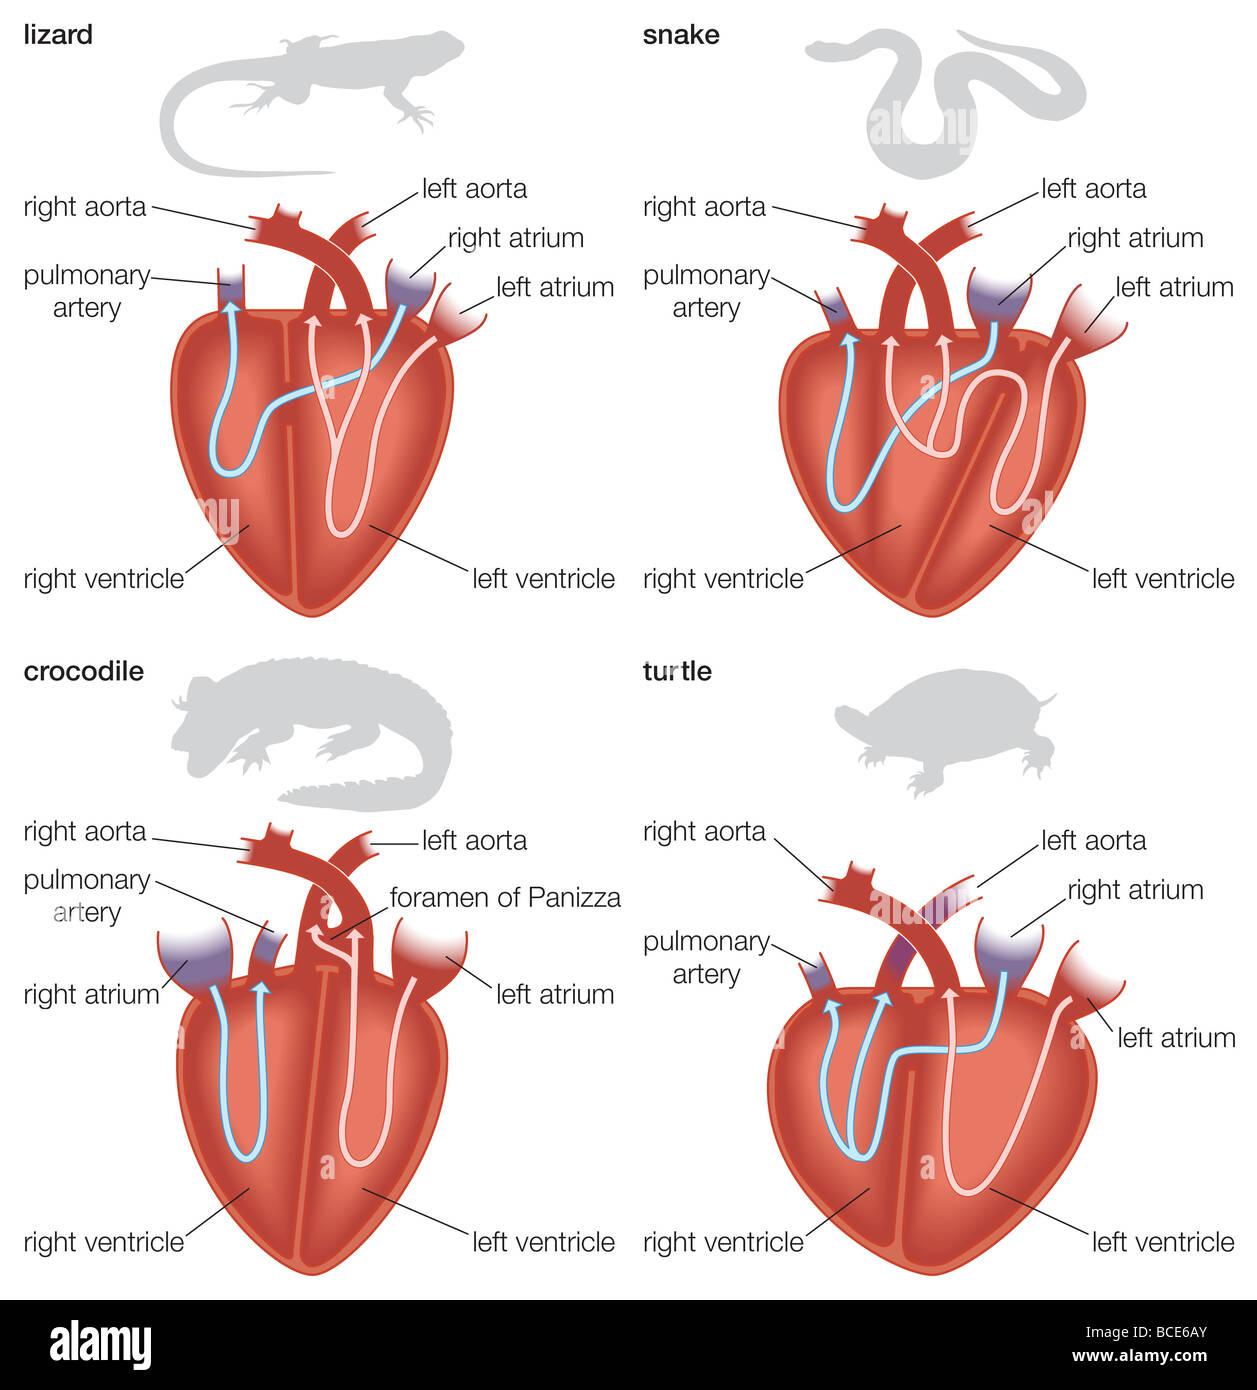 hight resolution of types of reptilian hearts lizard snake crocodile and lizard diagram internal diagram of dorsal view of lizard